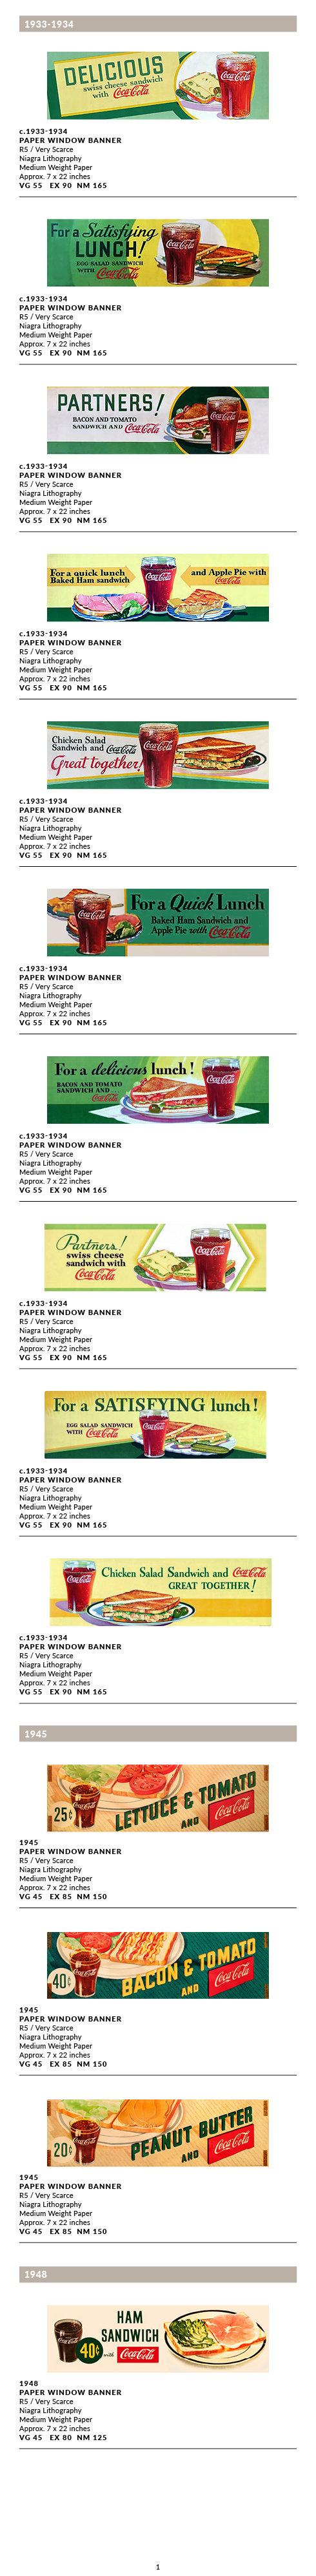 Food Channel Card.jpg